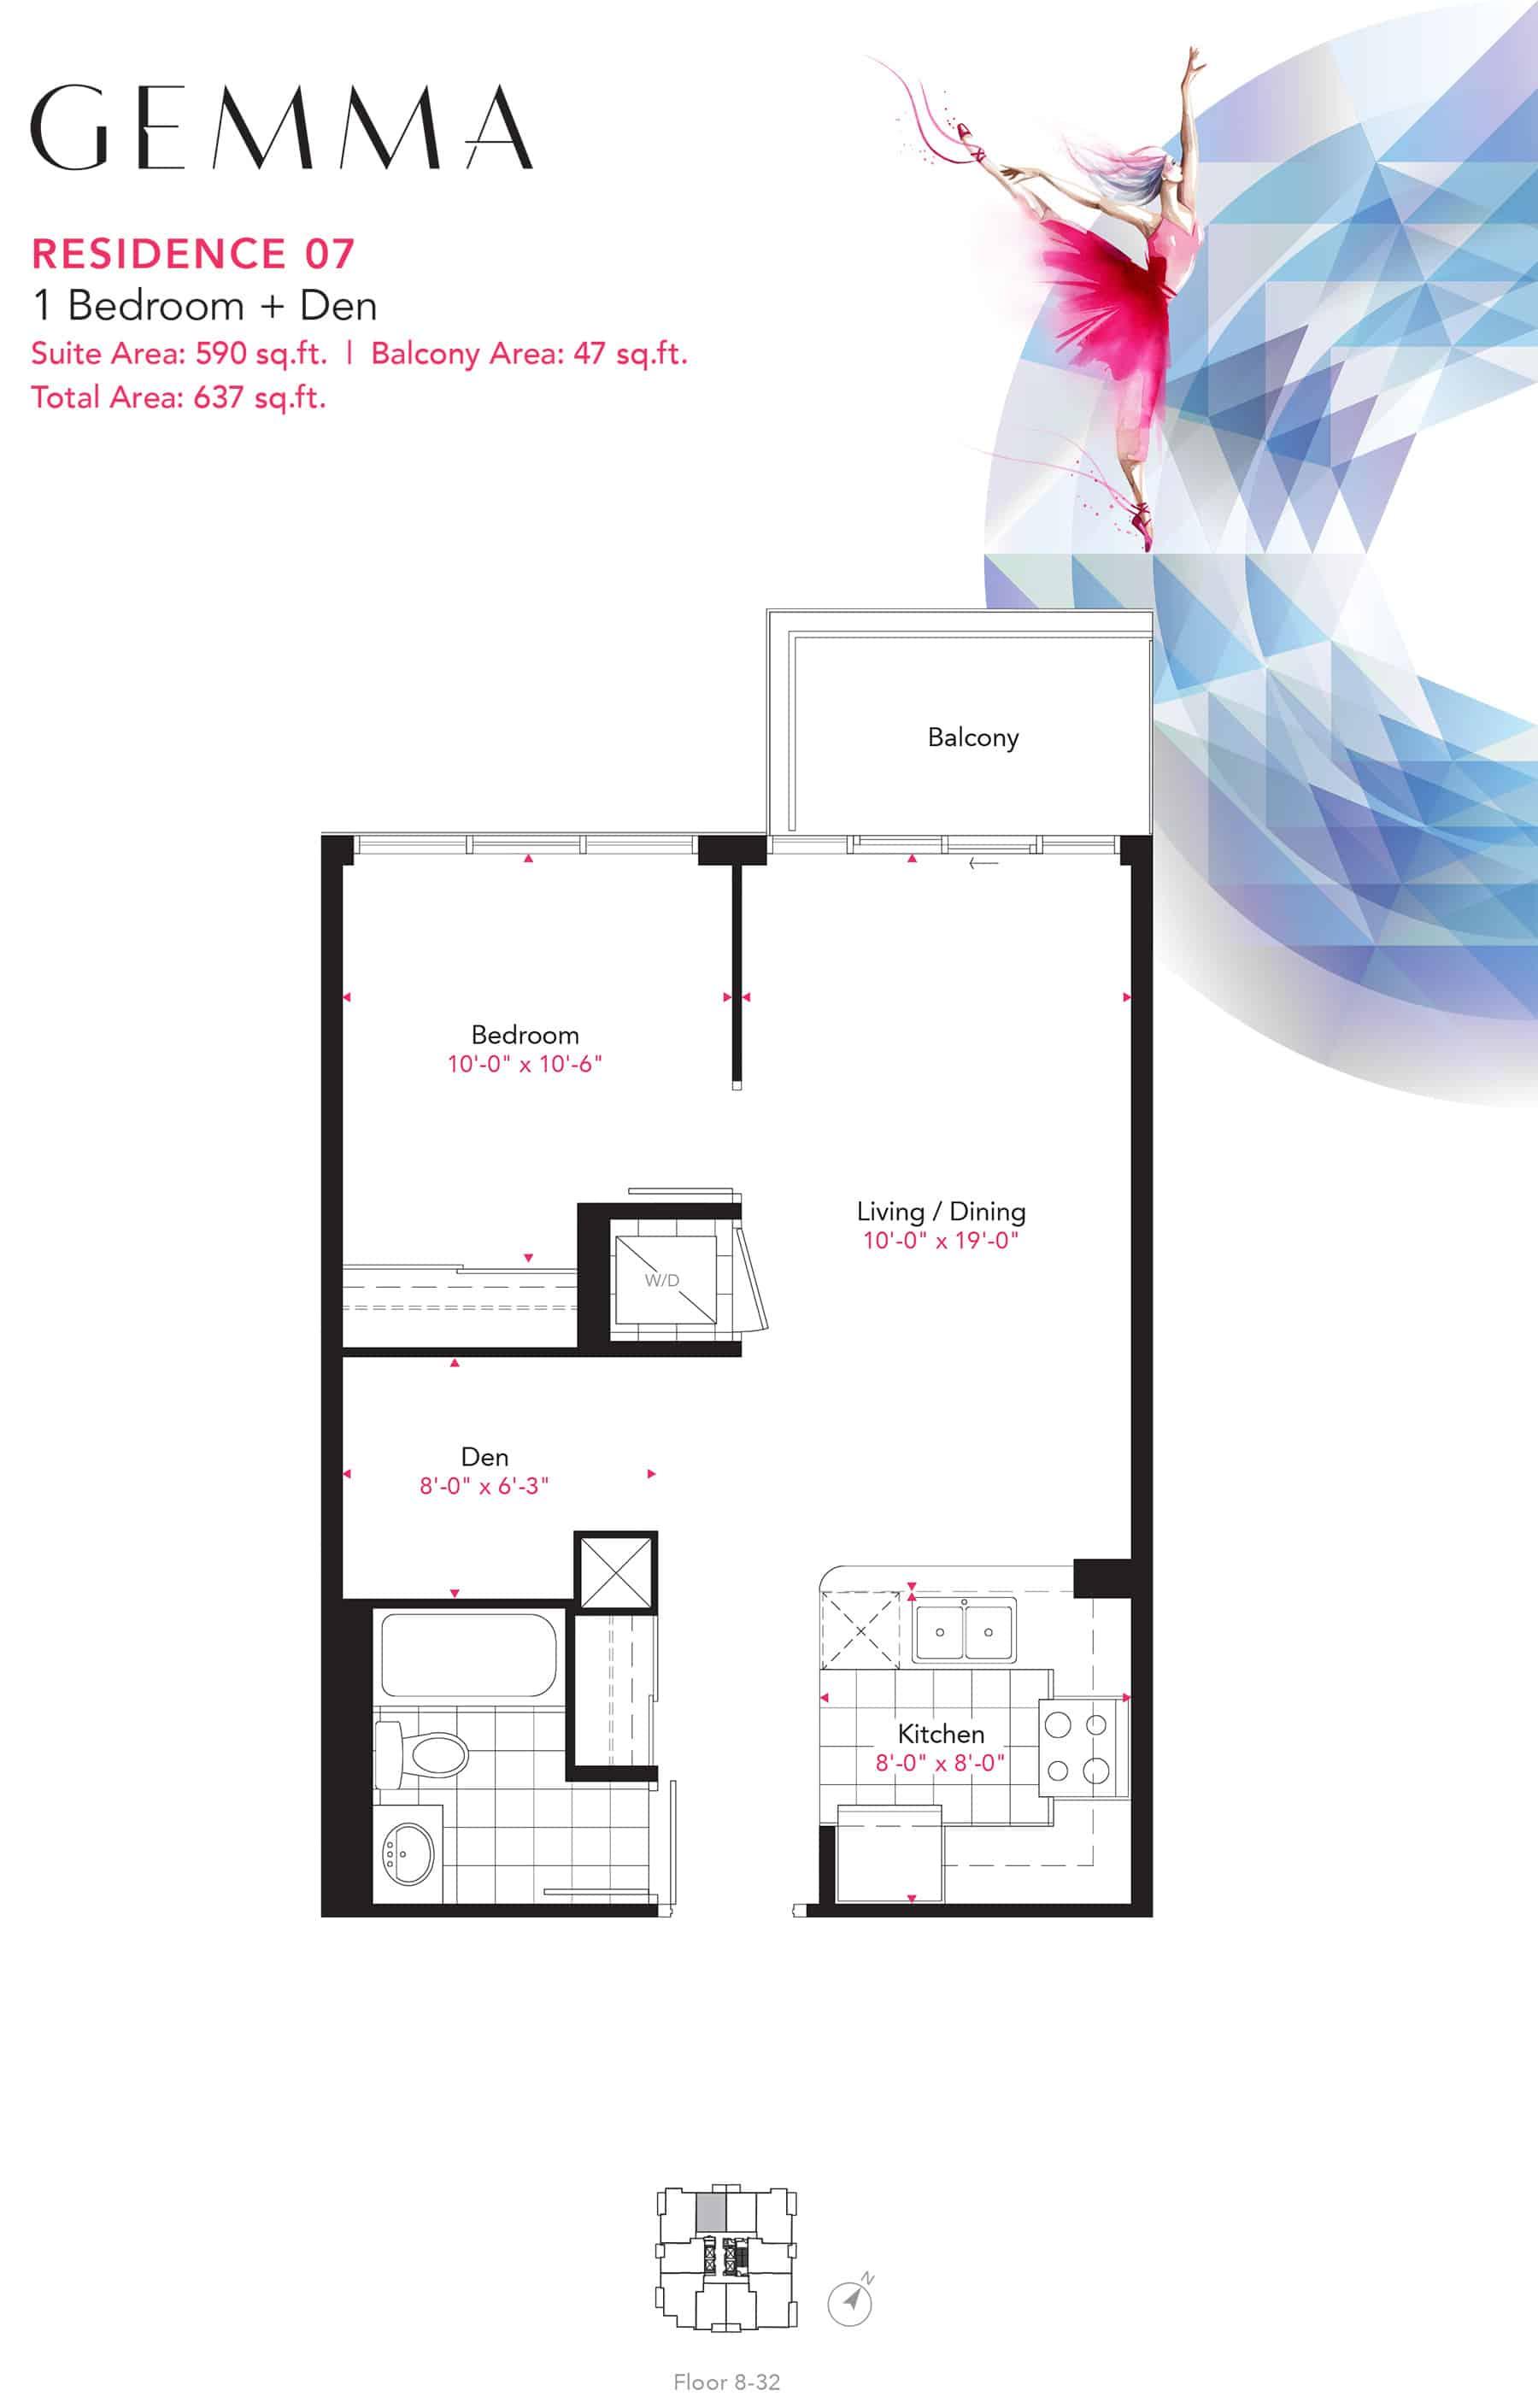 Residence-07-1B+D-590-Sqft-Gemma  Gemma Condos Residence 07 1BD 590 Sqft Gemma